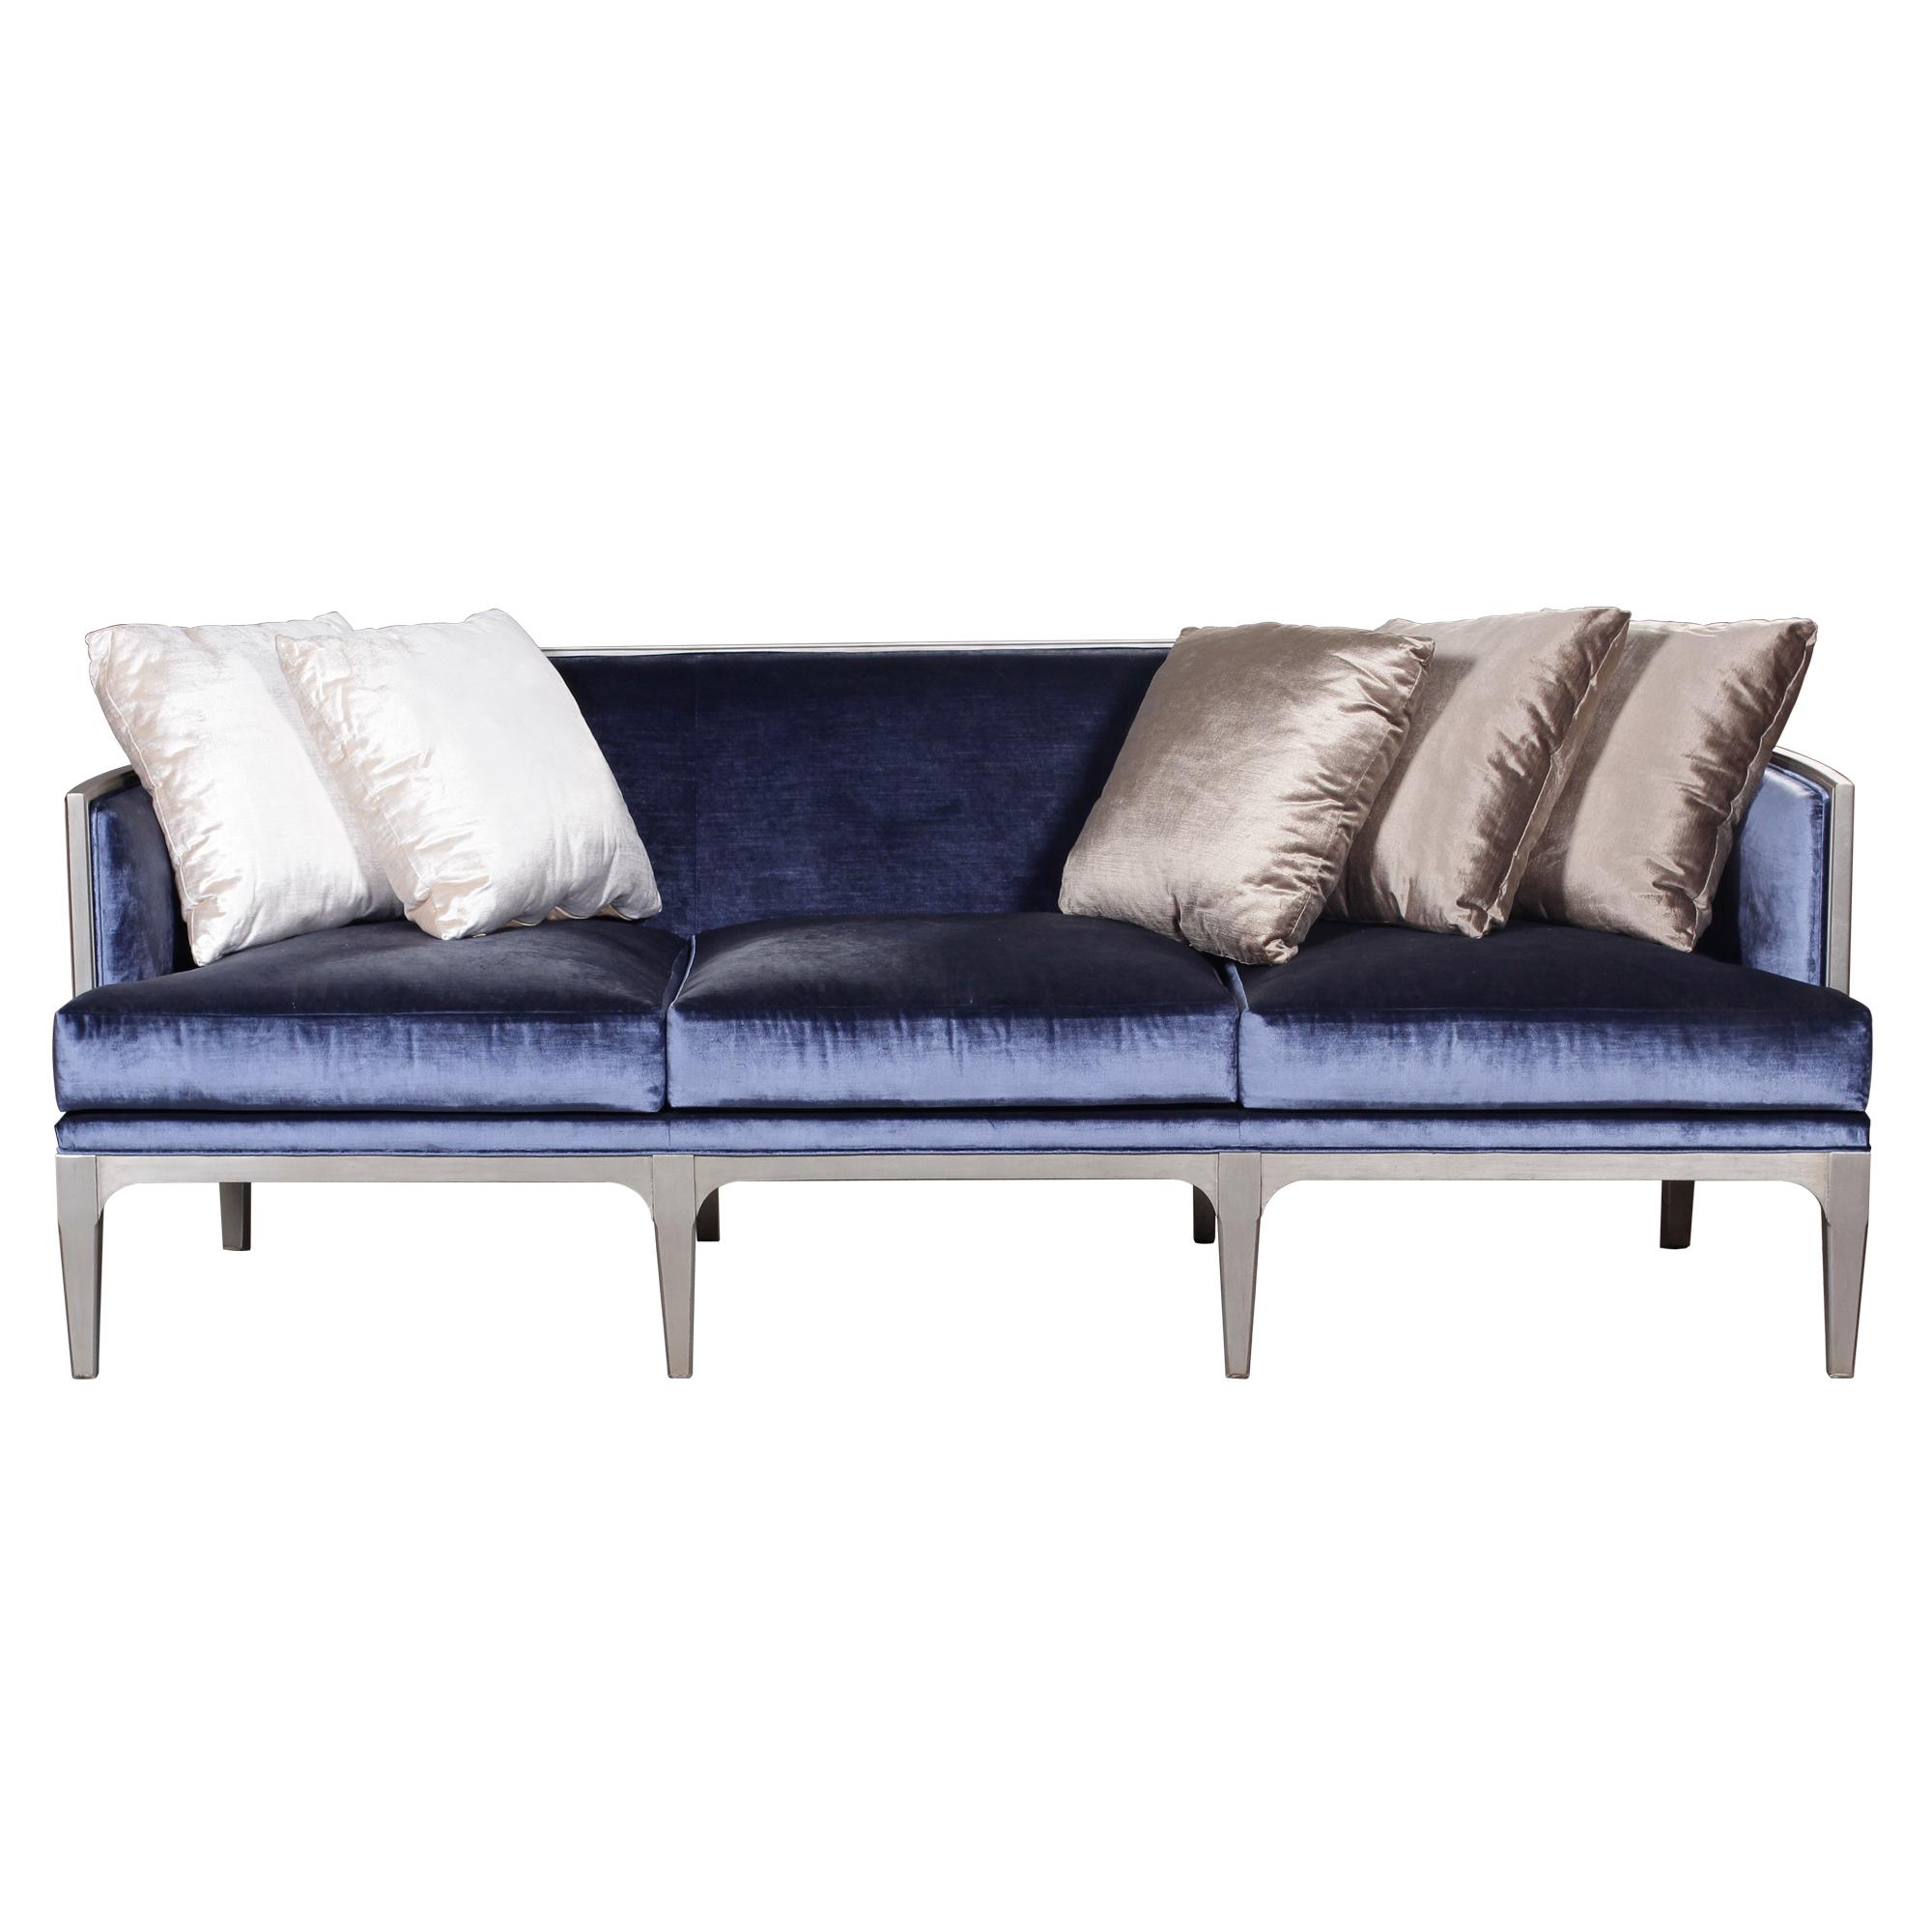 34618---Three-Seater-Sofa-Ornamento,-SG-+-083-&-5x-TP1---Throw-Pillow---40x40cm-(053+081),-New2017---1